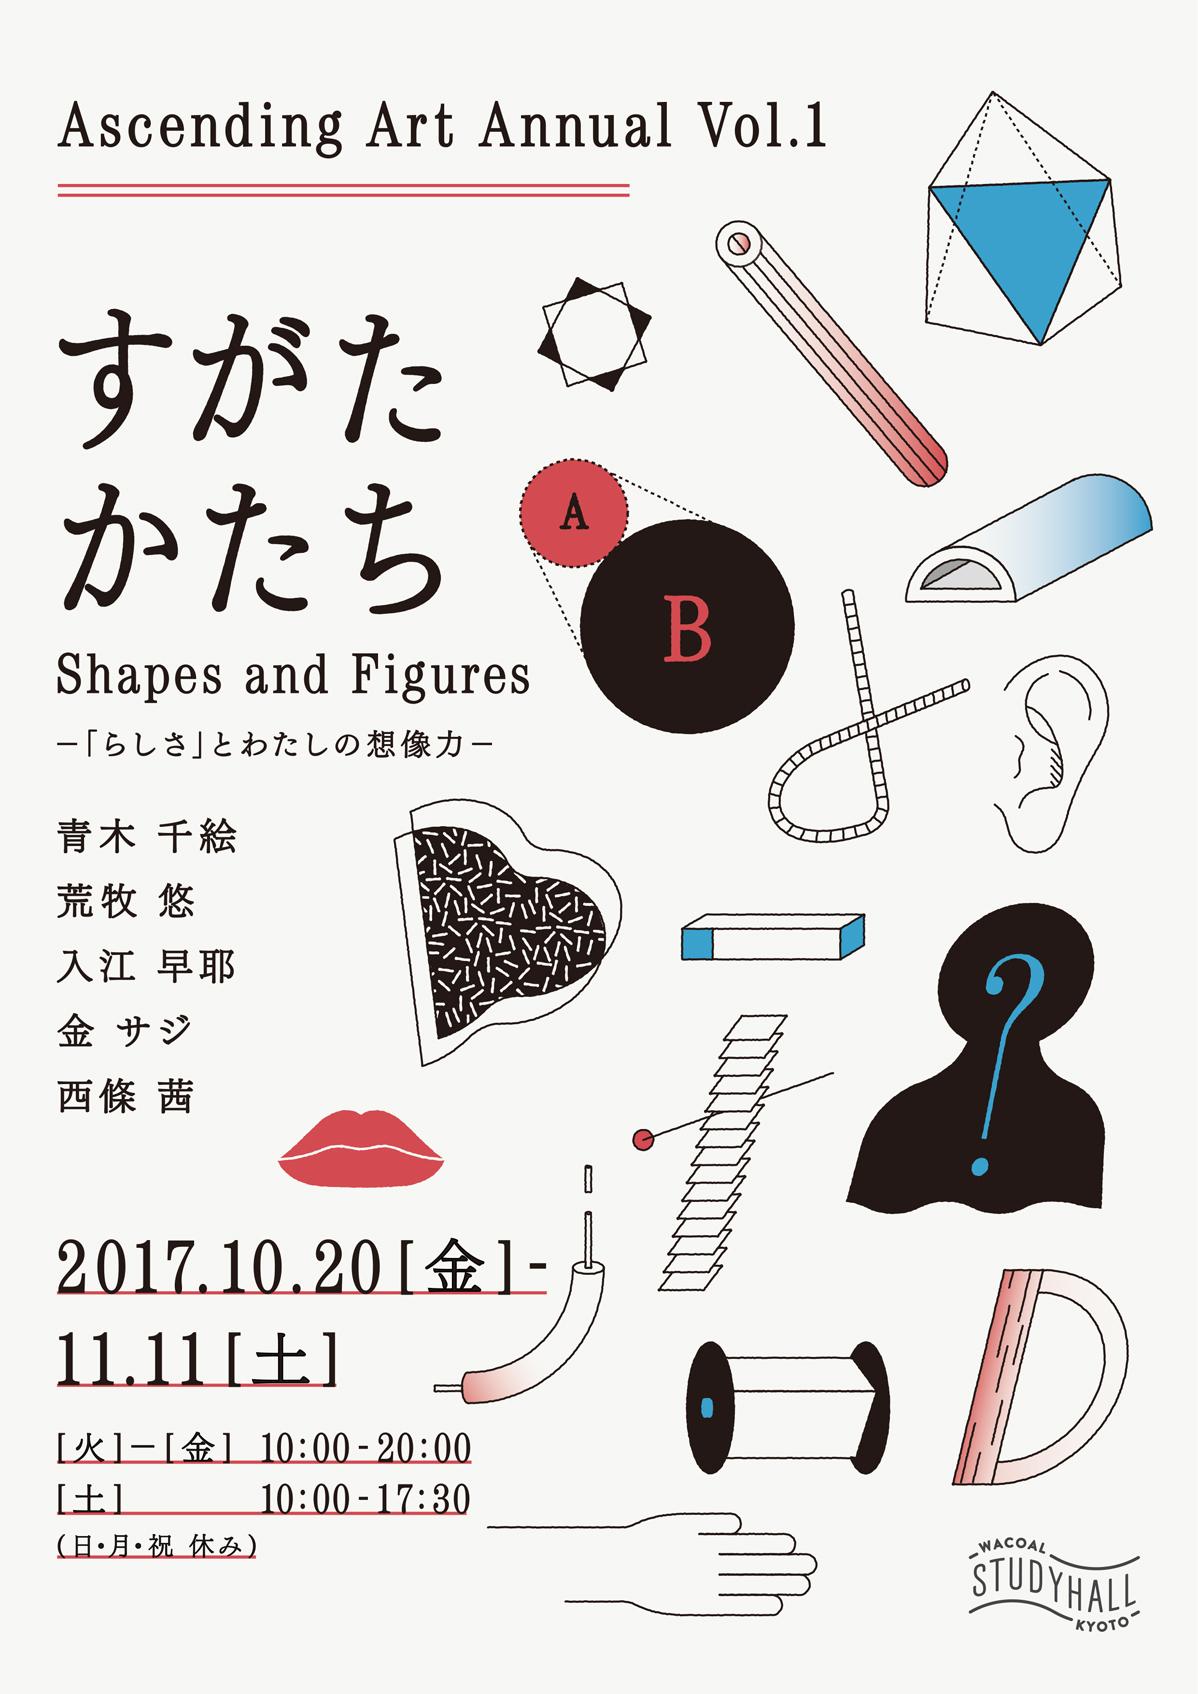 Ascending Art Annual Vol.1 すがたかたち Shapes and Figures -「らしさ」とわたしの想像力-